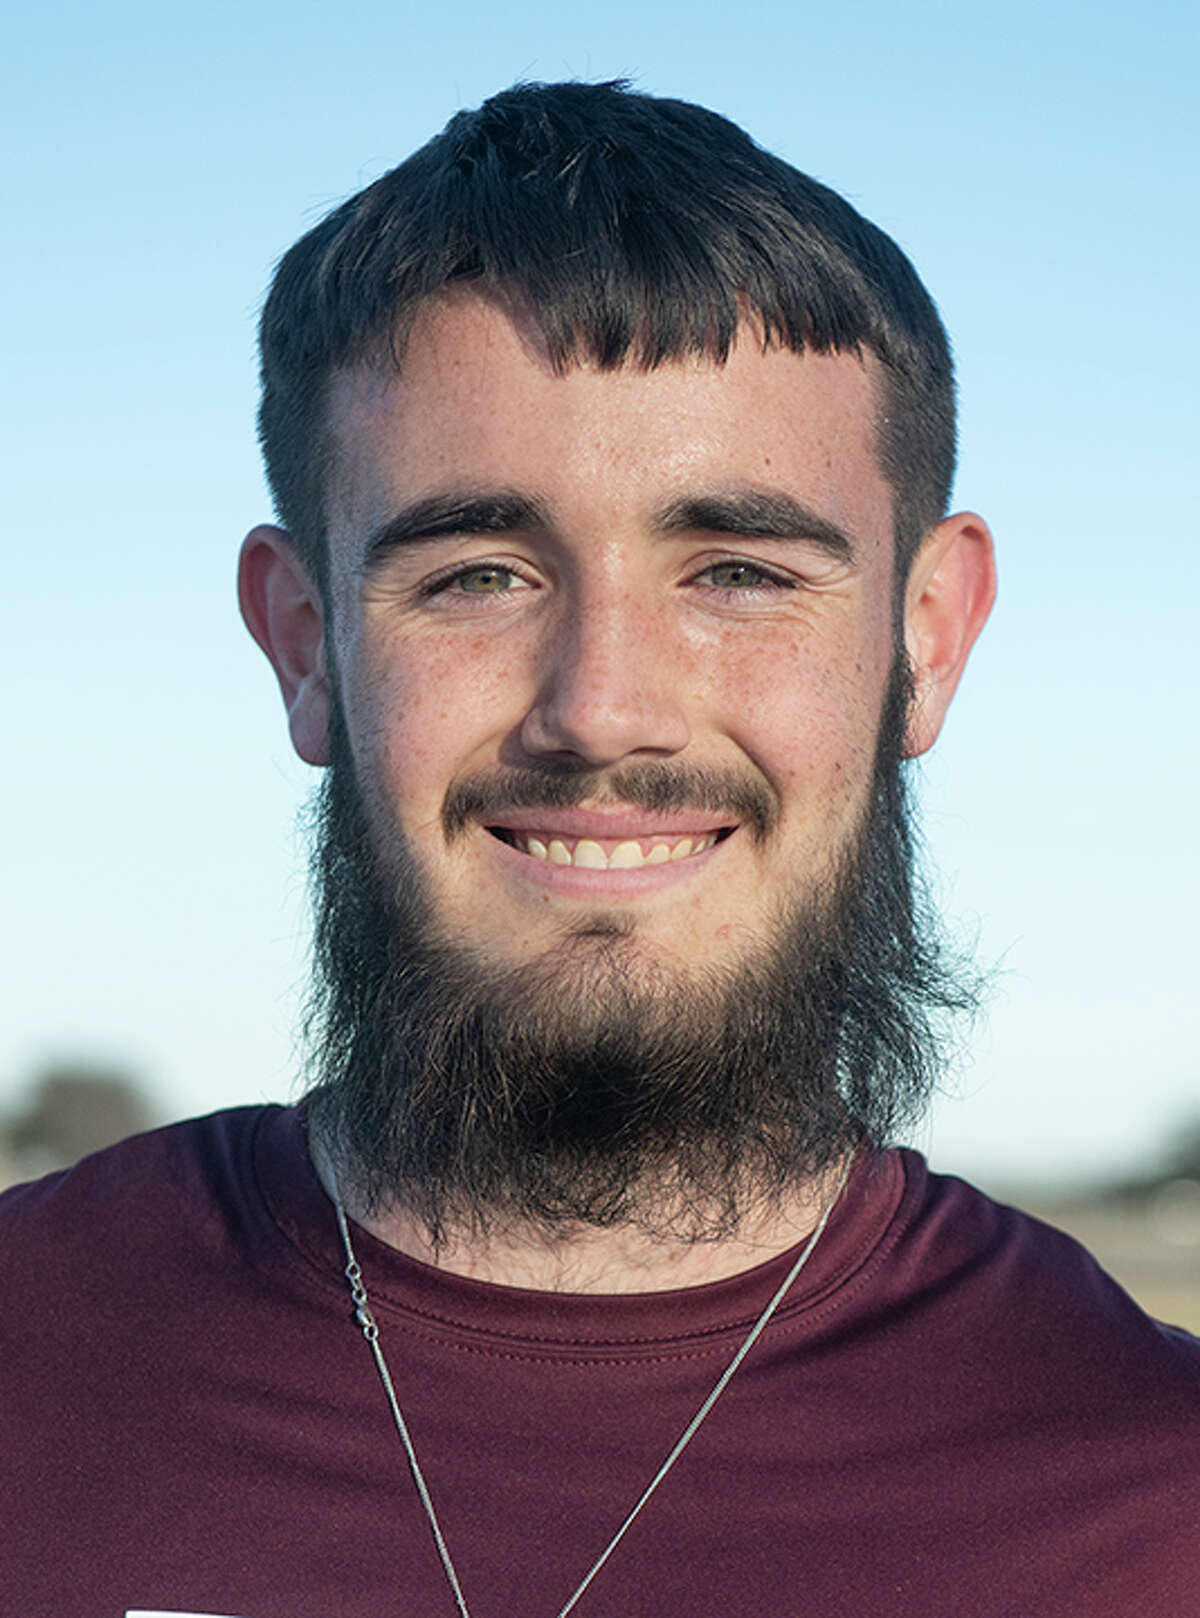 Meet the Team: Tanner Holladay